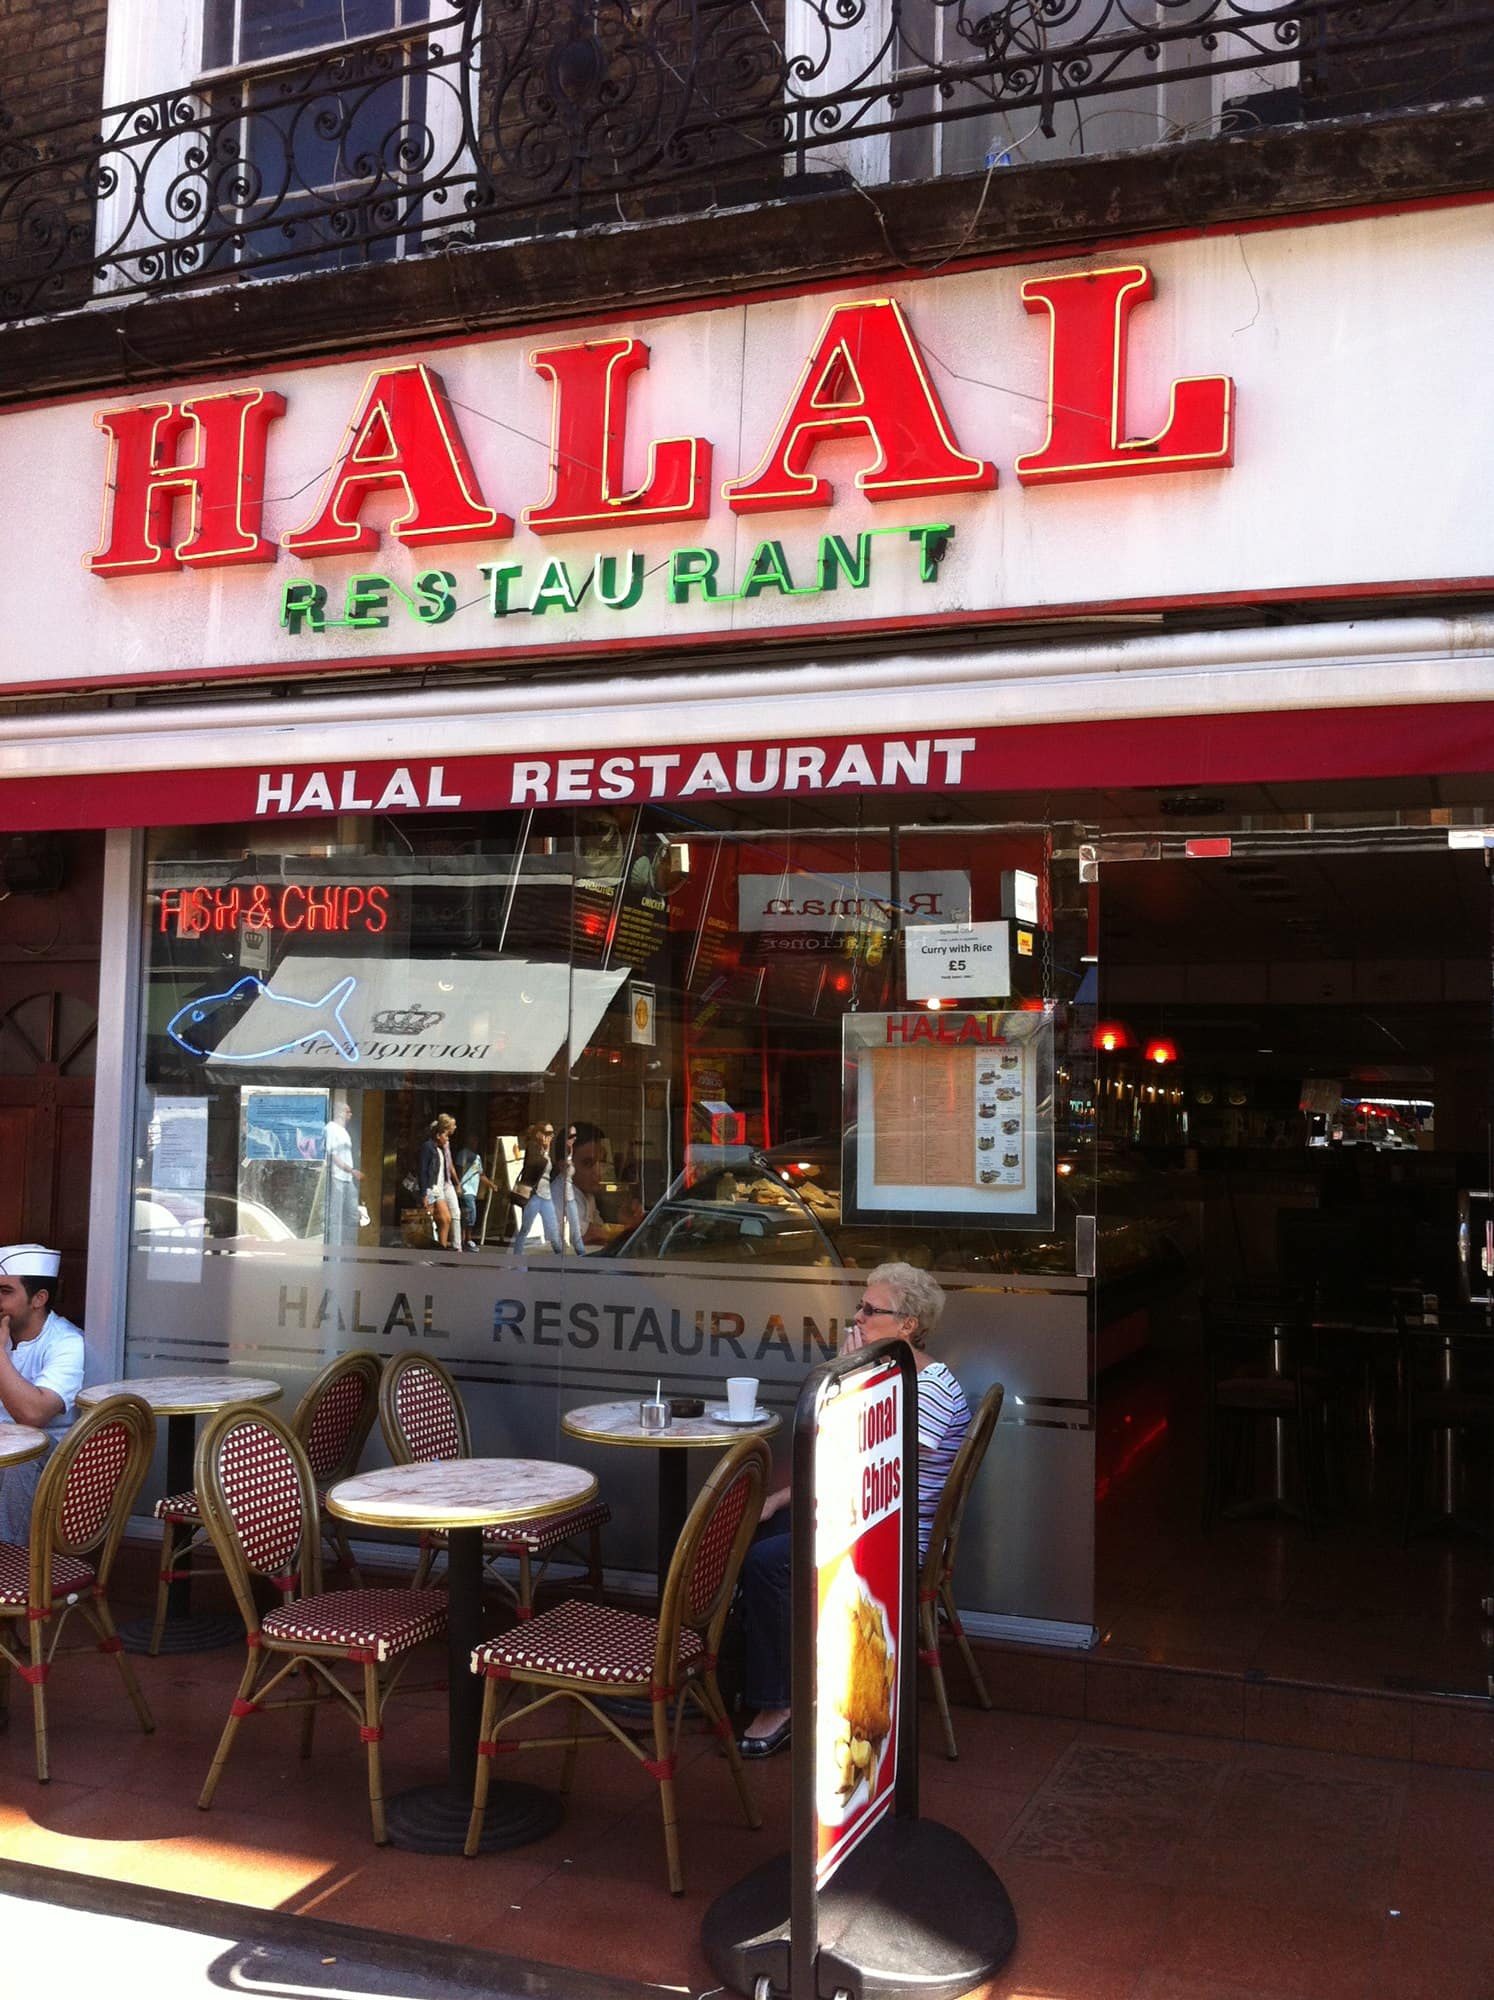 Halal Restaurant Bayswater London